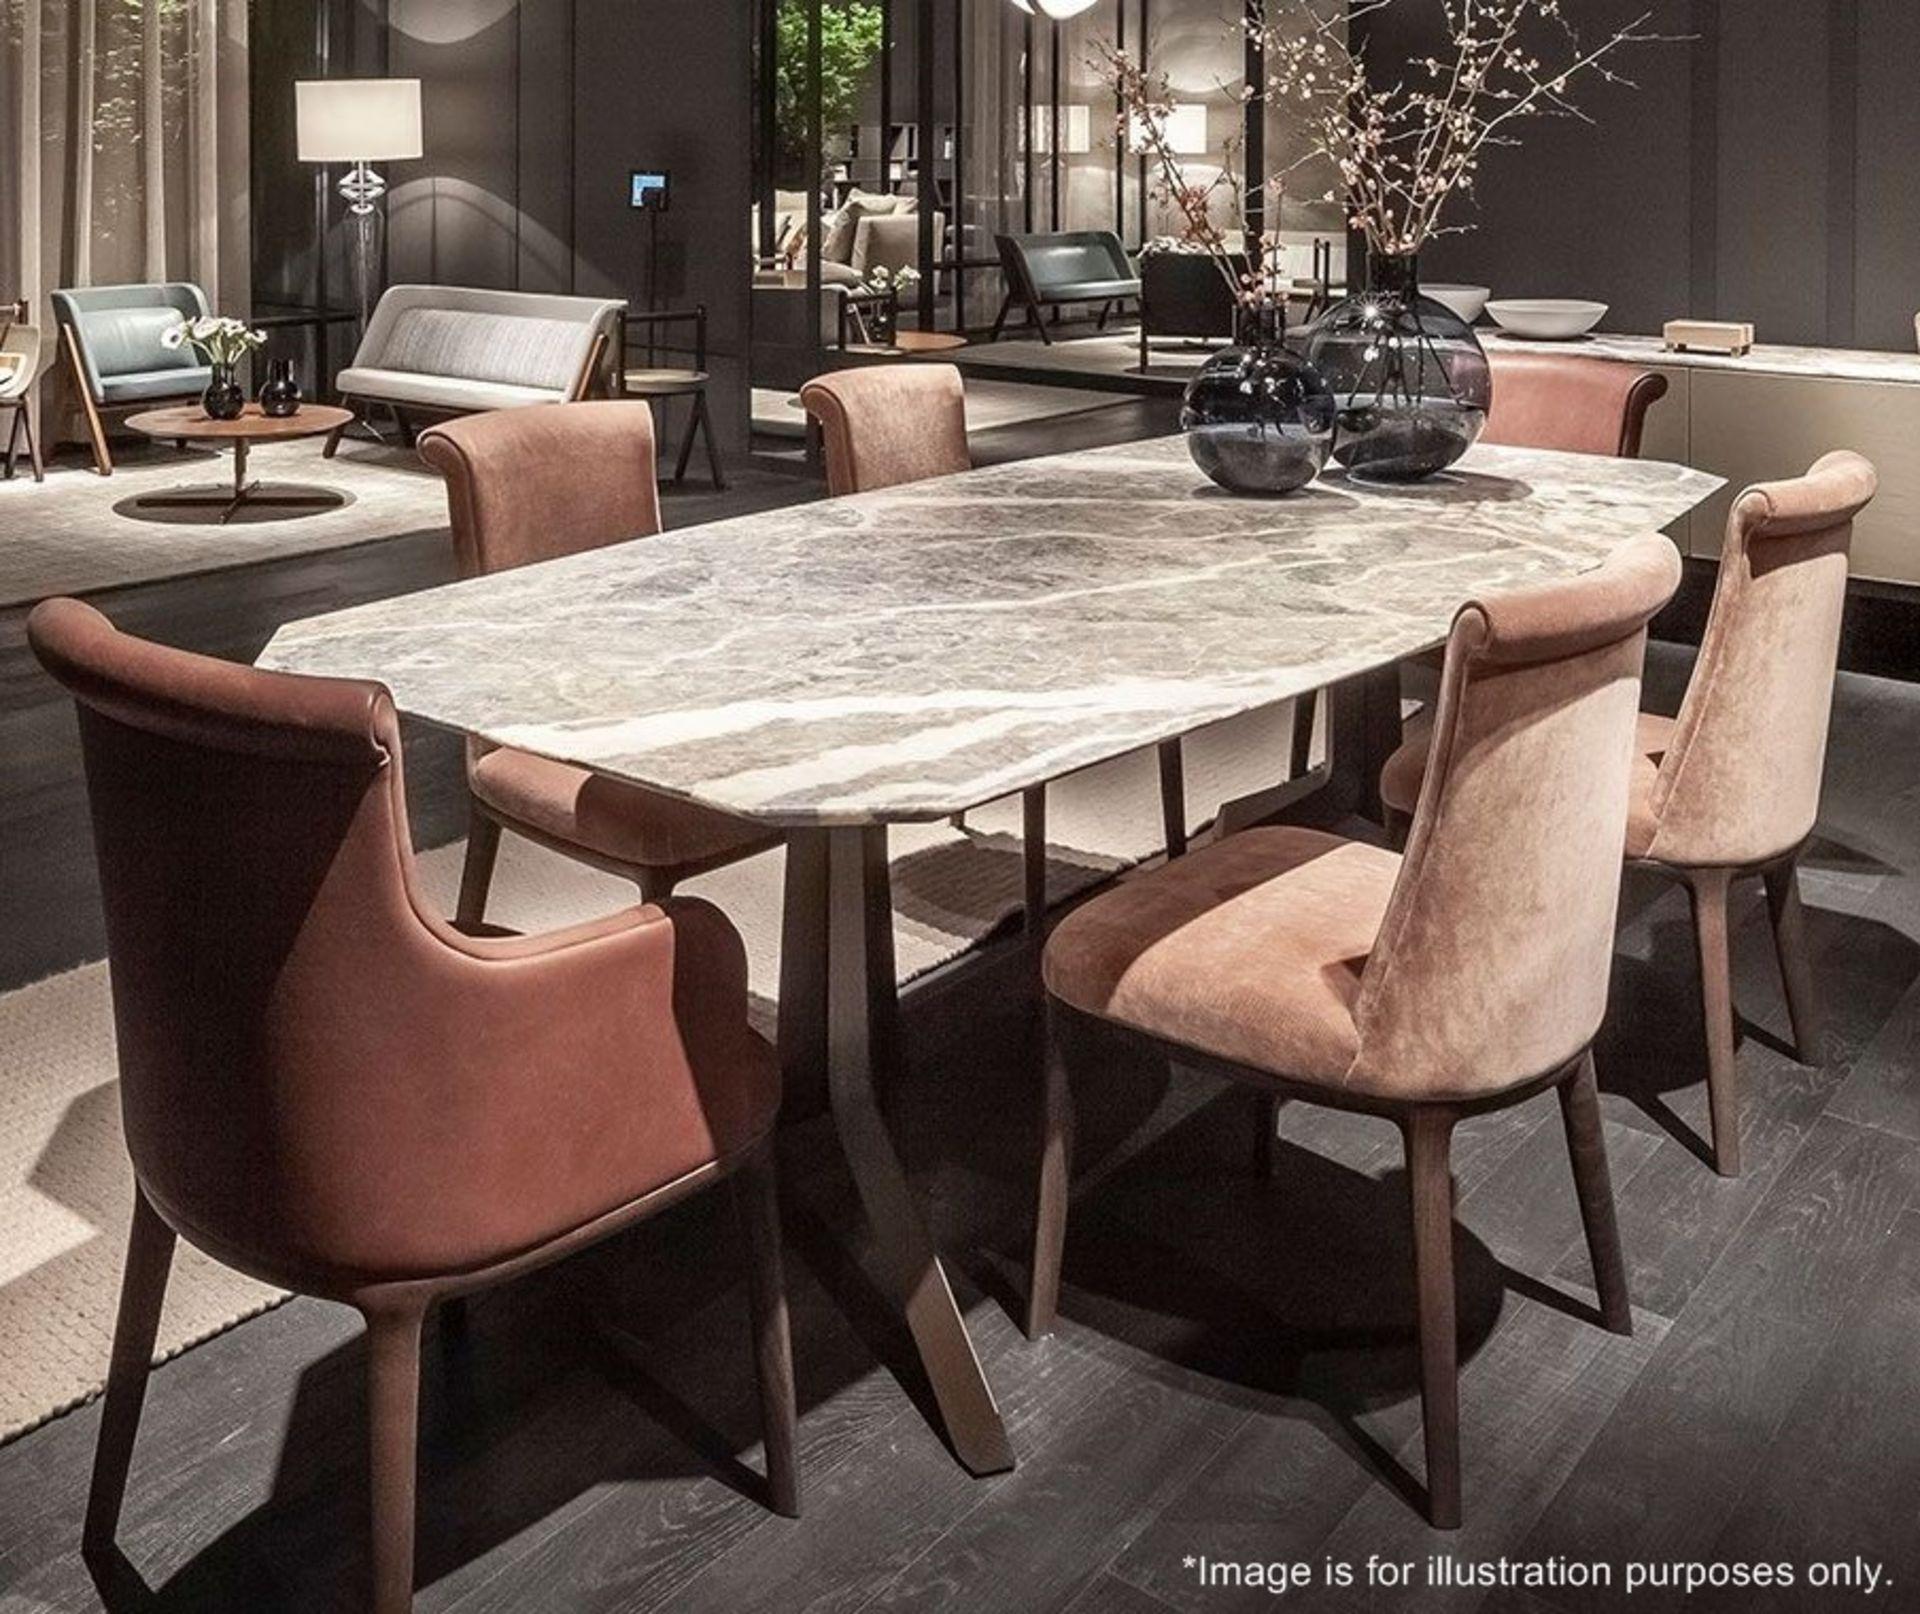 1 x POLTRONA FRAU 'Othello' Fior Di Pesco 2.6 Metre Long Marble Table Top - Dimensions: 260x100cm - Image 3 of 6